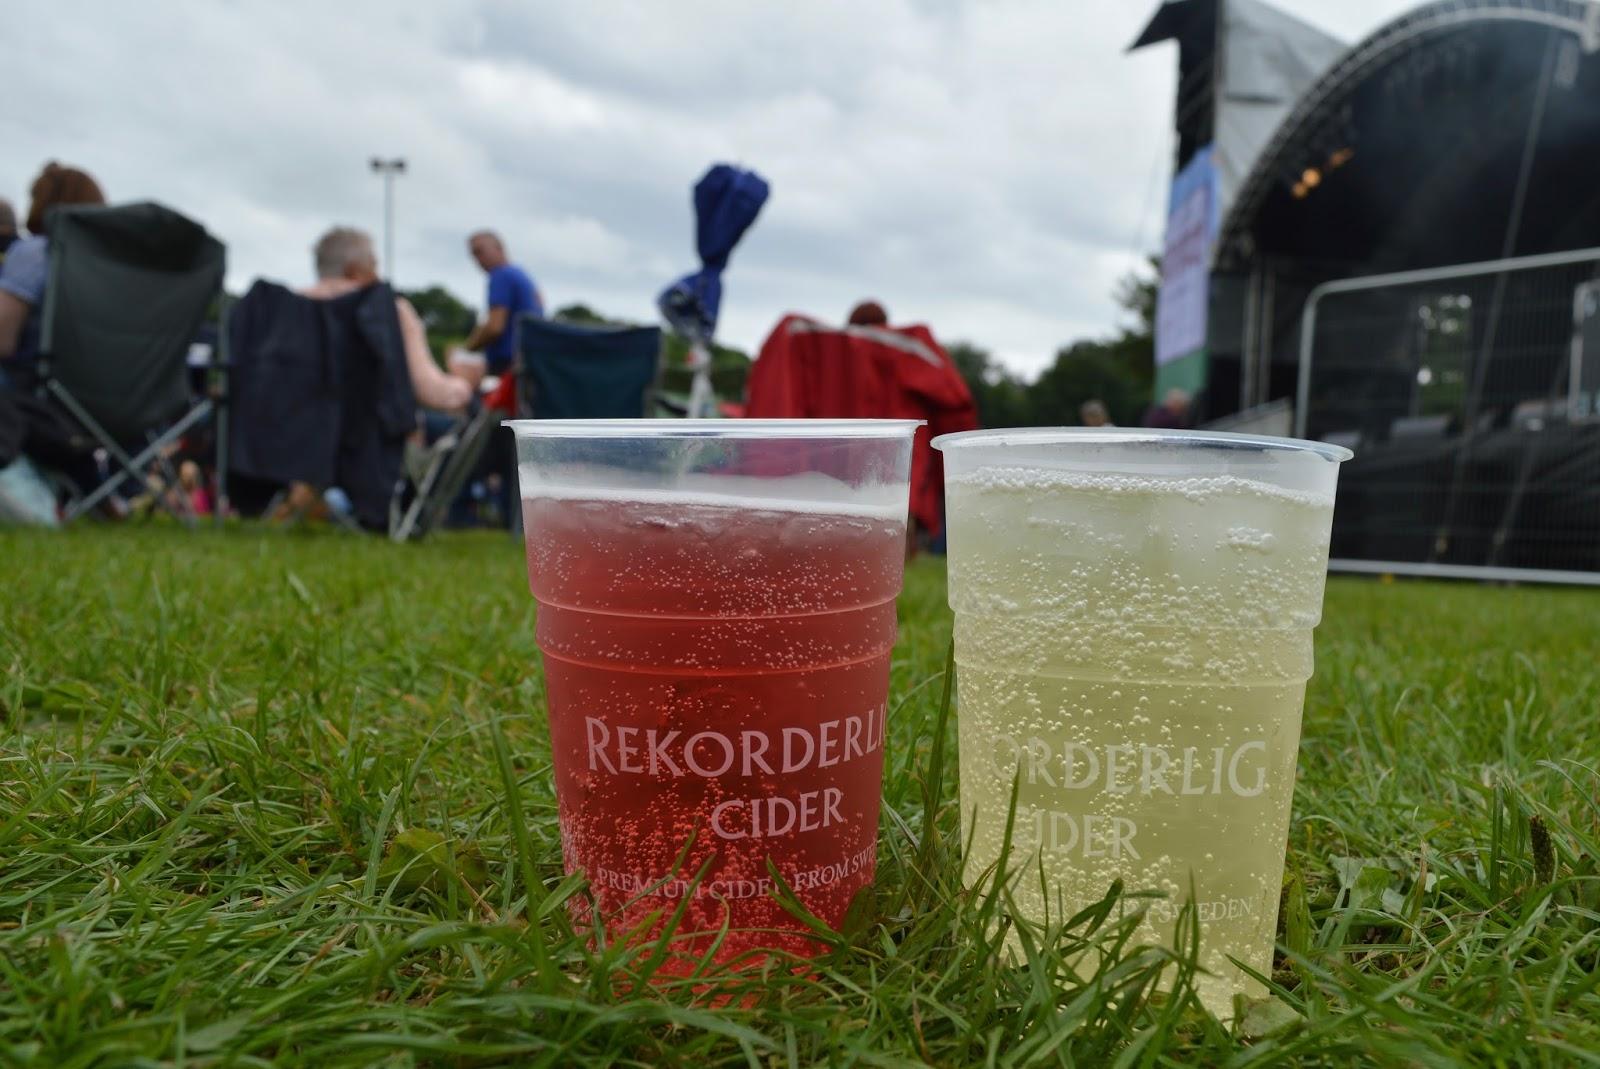 Corbridge Festival 2016 - cider